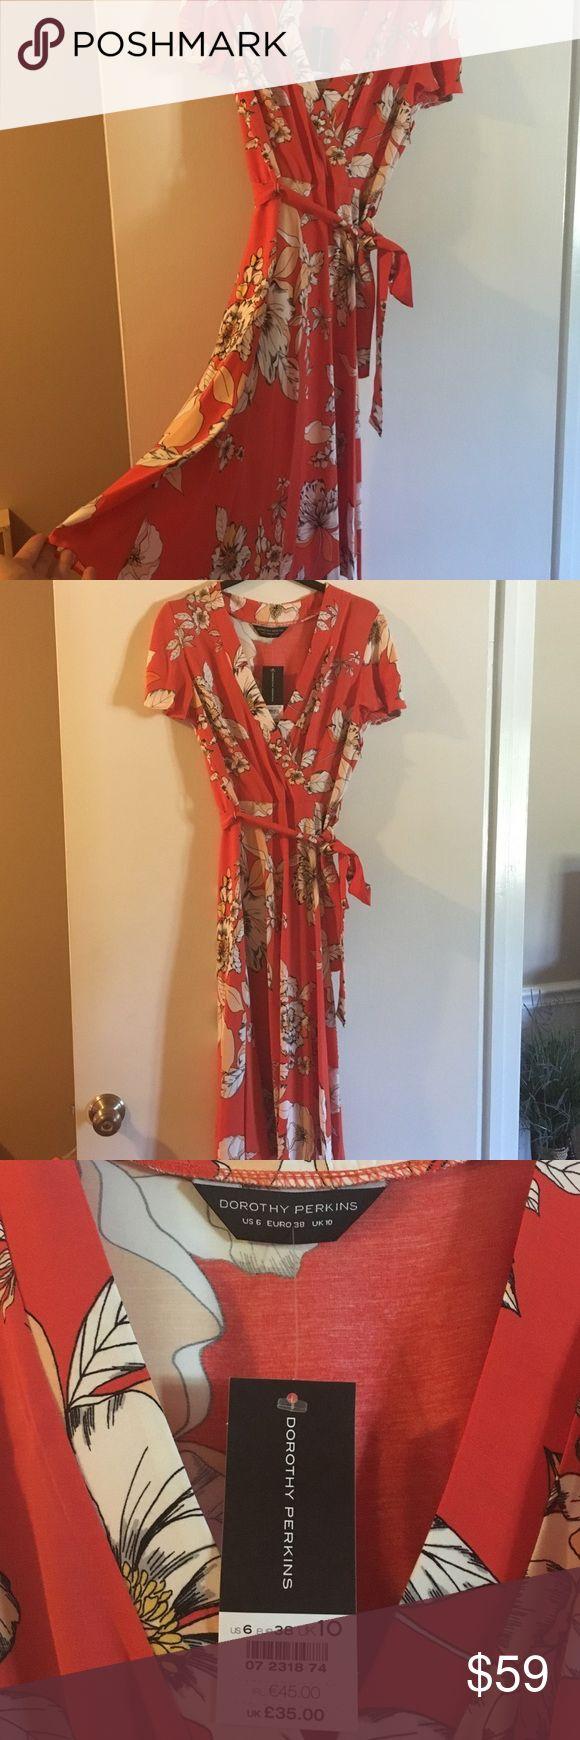 Dress from Dorothy Perkins Dresses, Clothes design